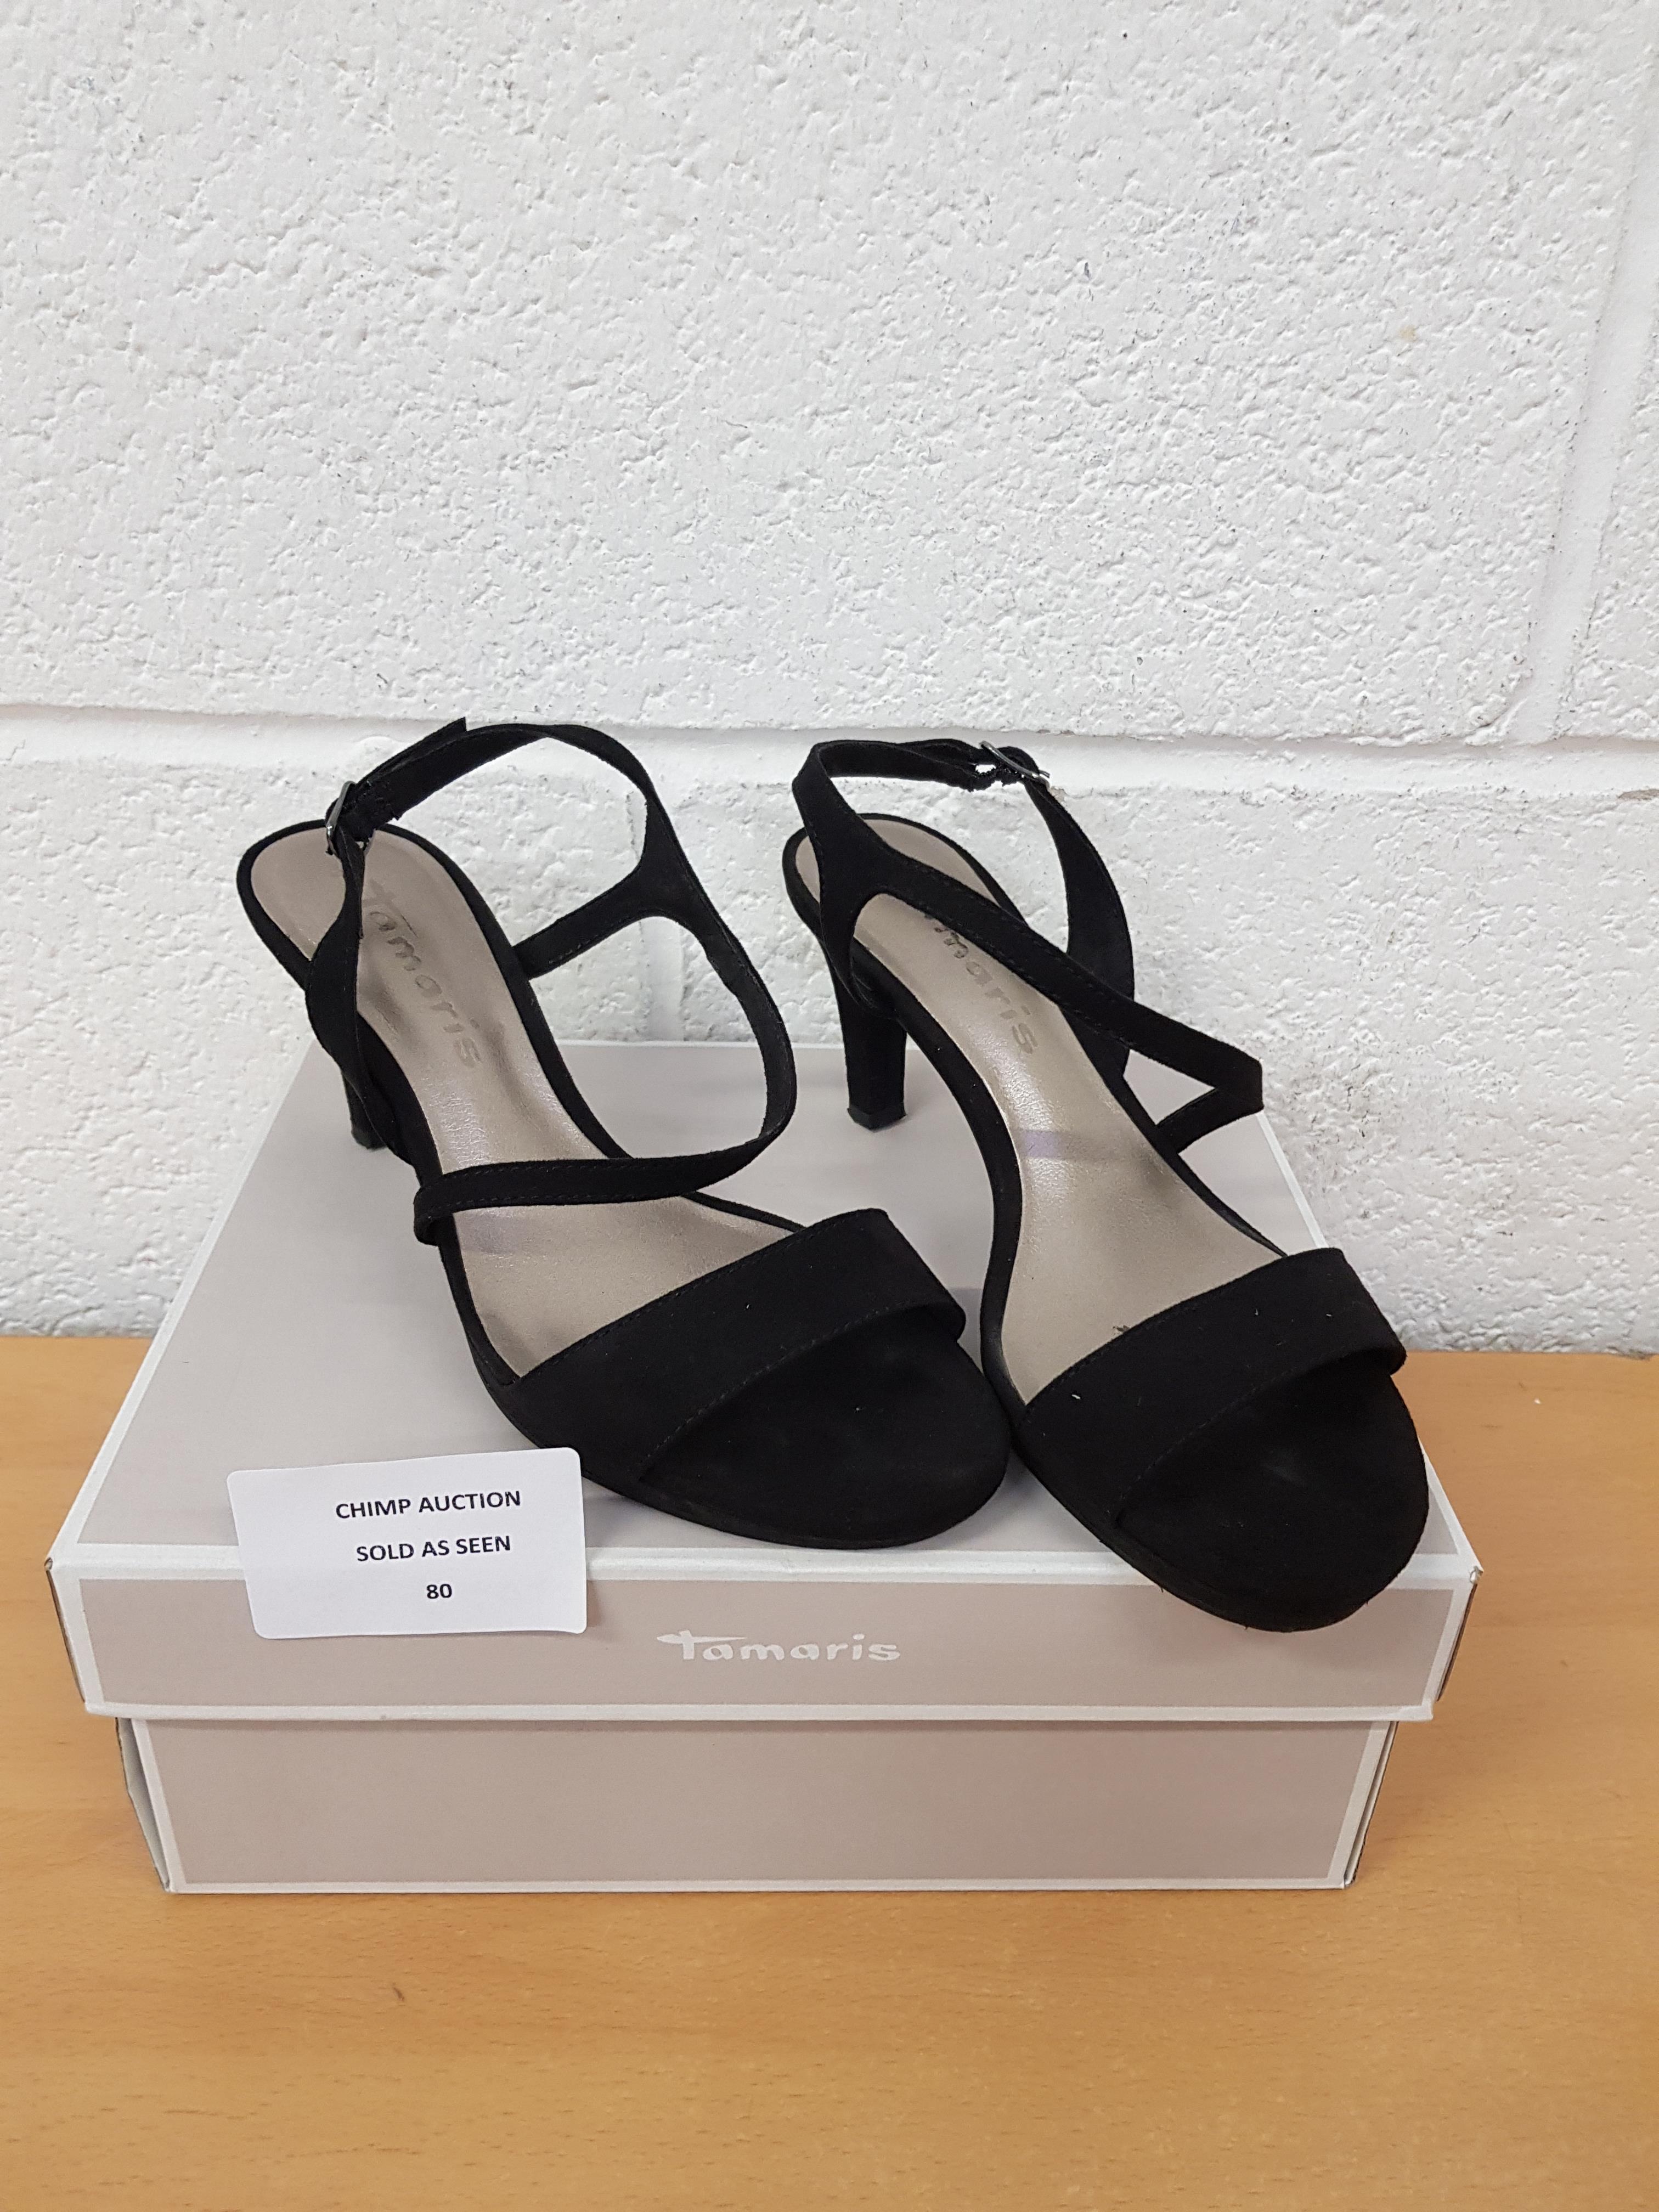 Lot 80 - Tamaris ladies shoes EU 37